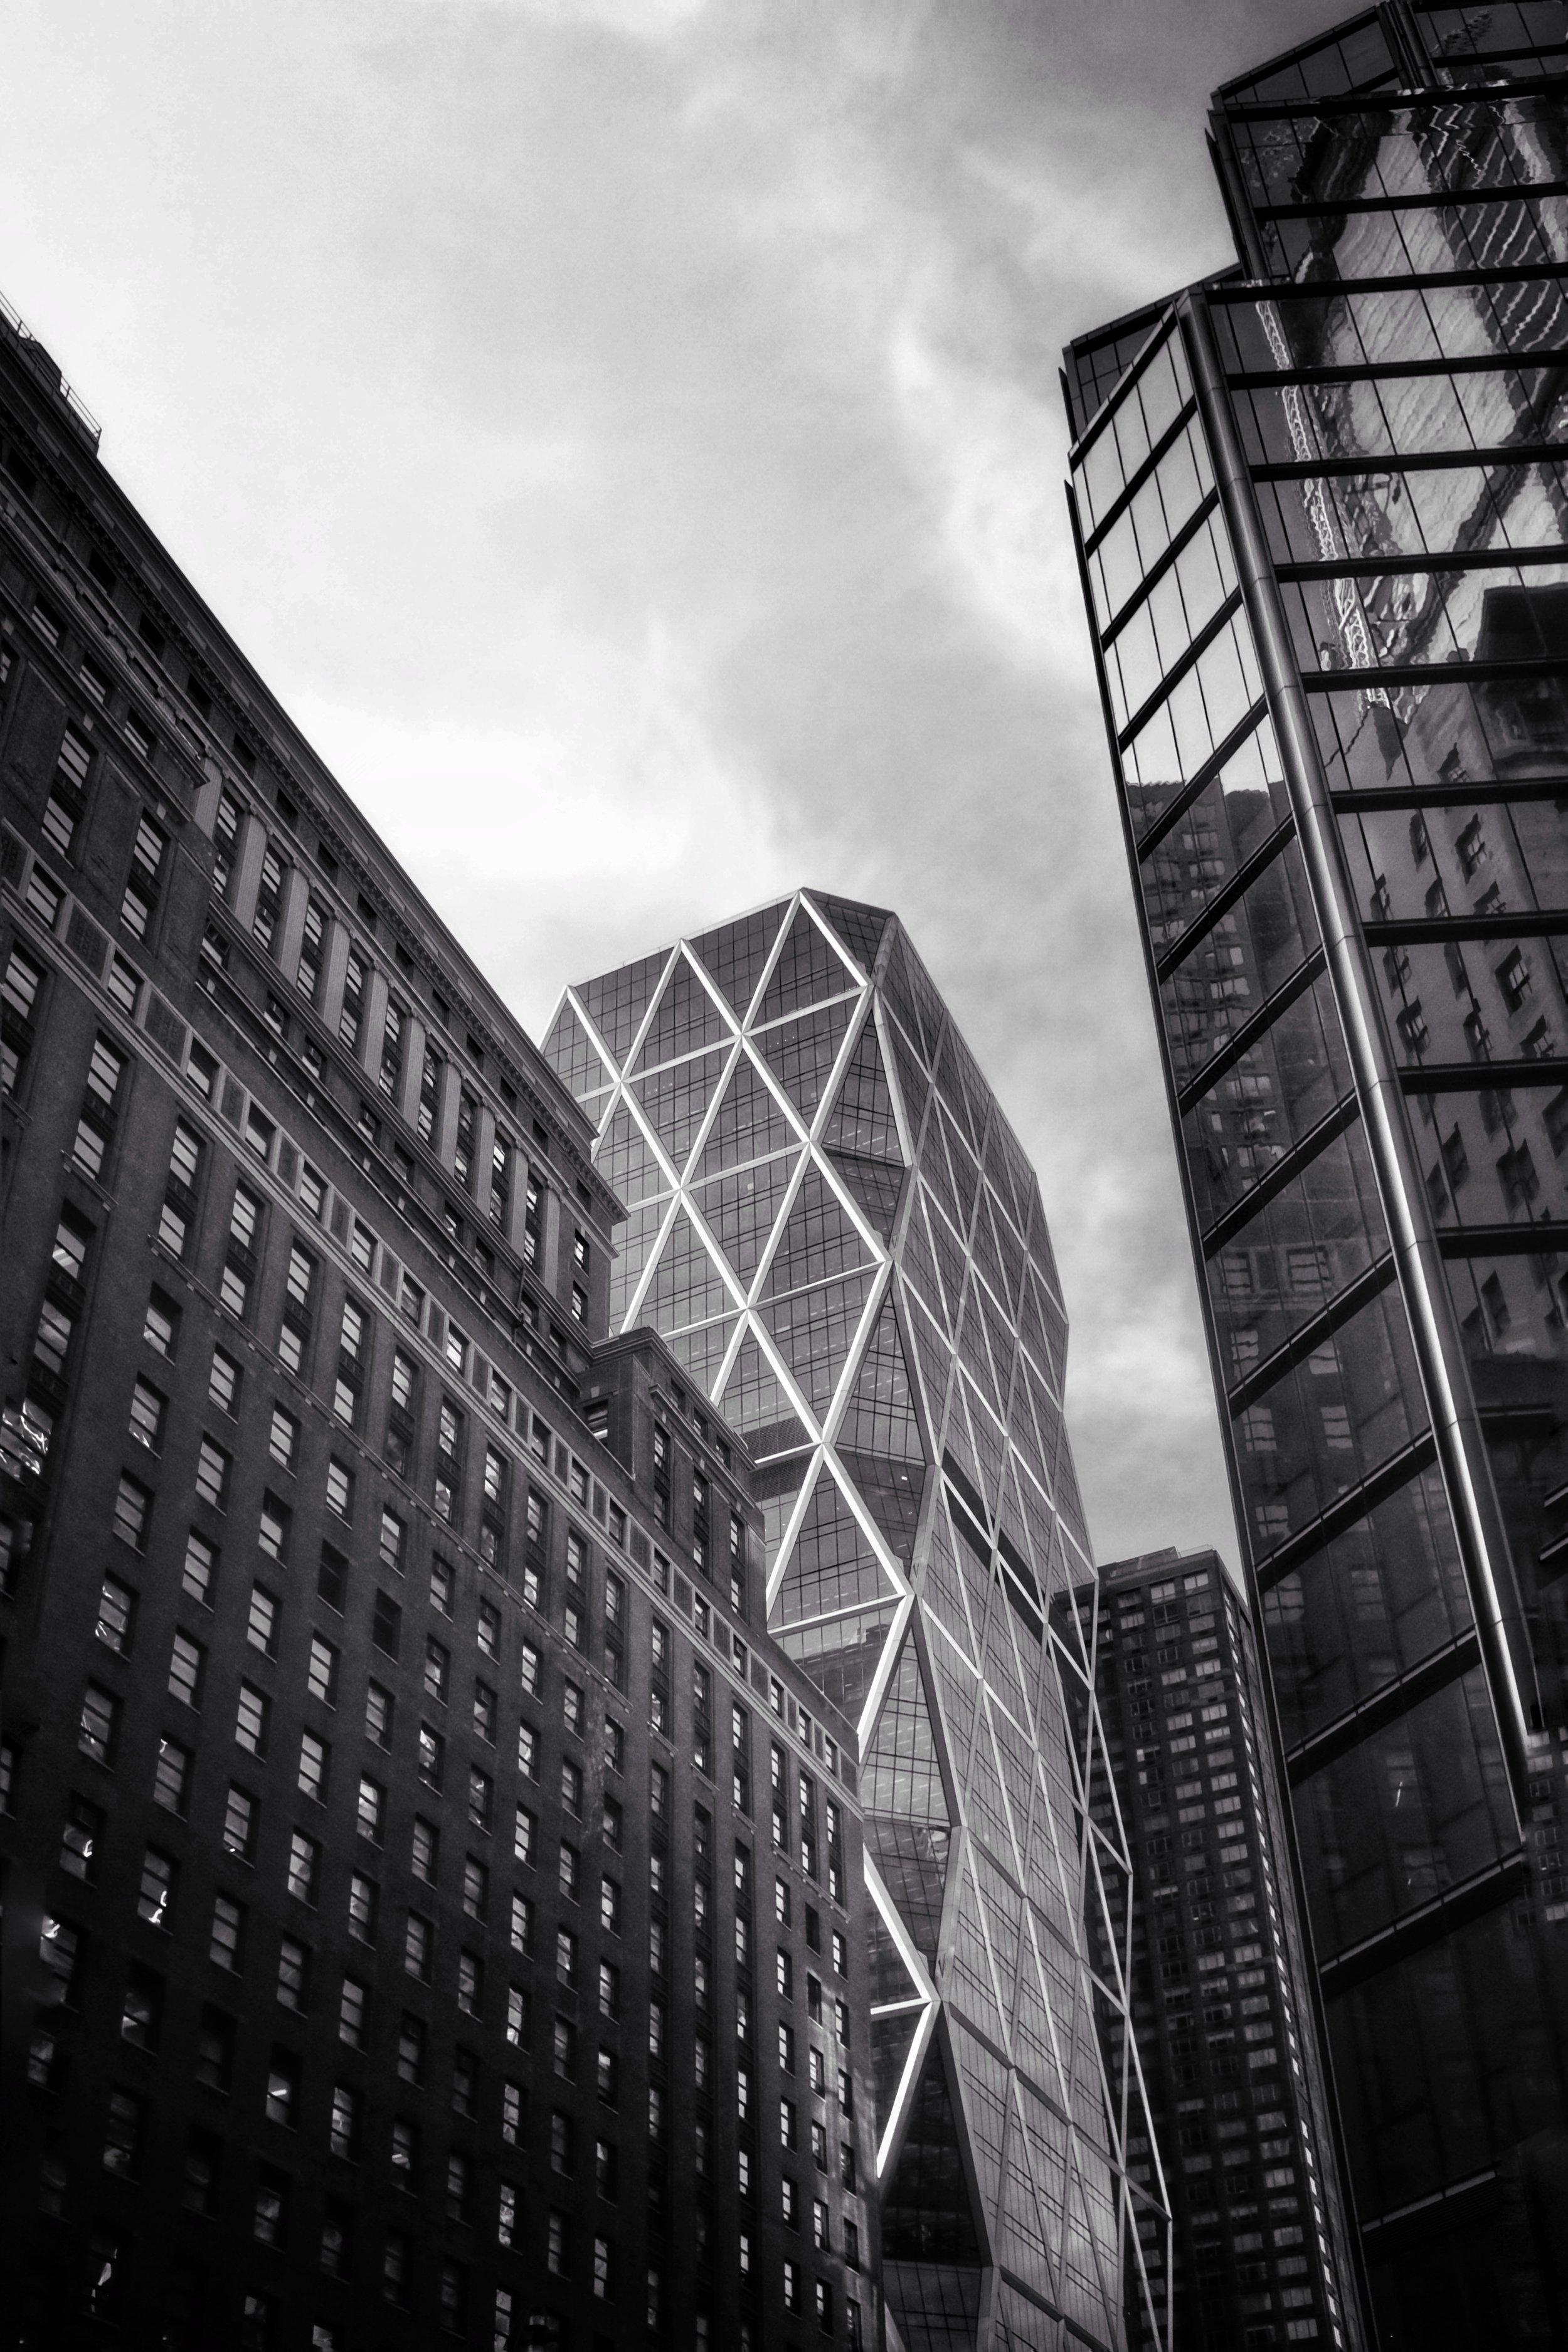 Hearst Tower. Manhattan. New York City. 2017.